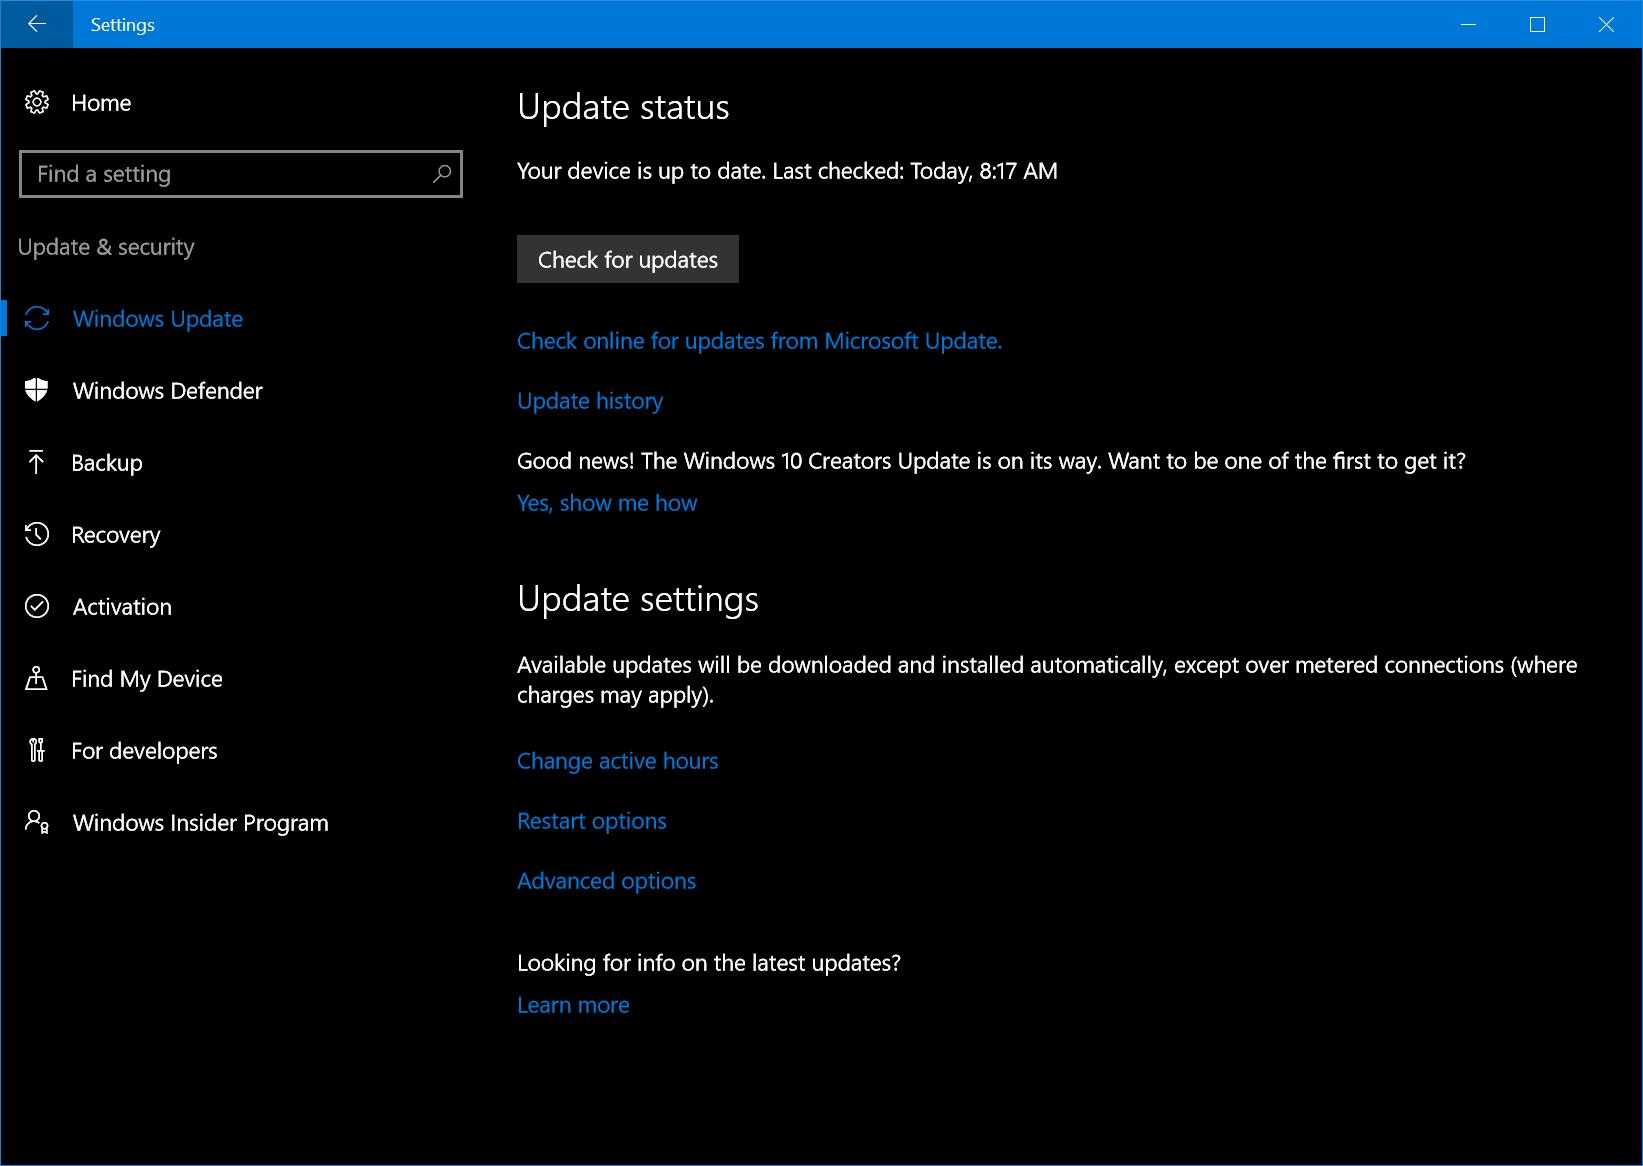 Screenshot of the Windows Update screen experience.